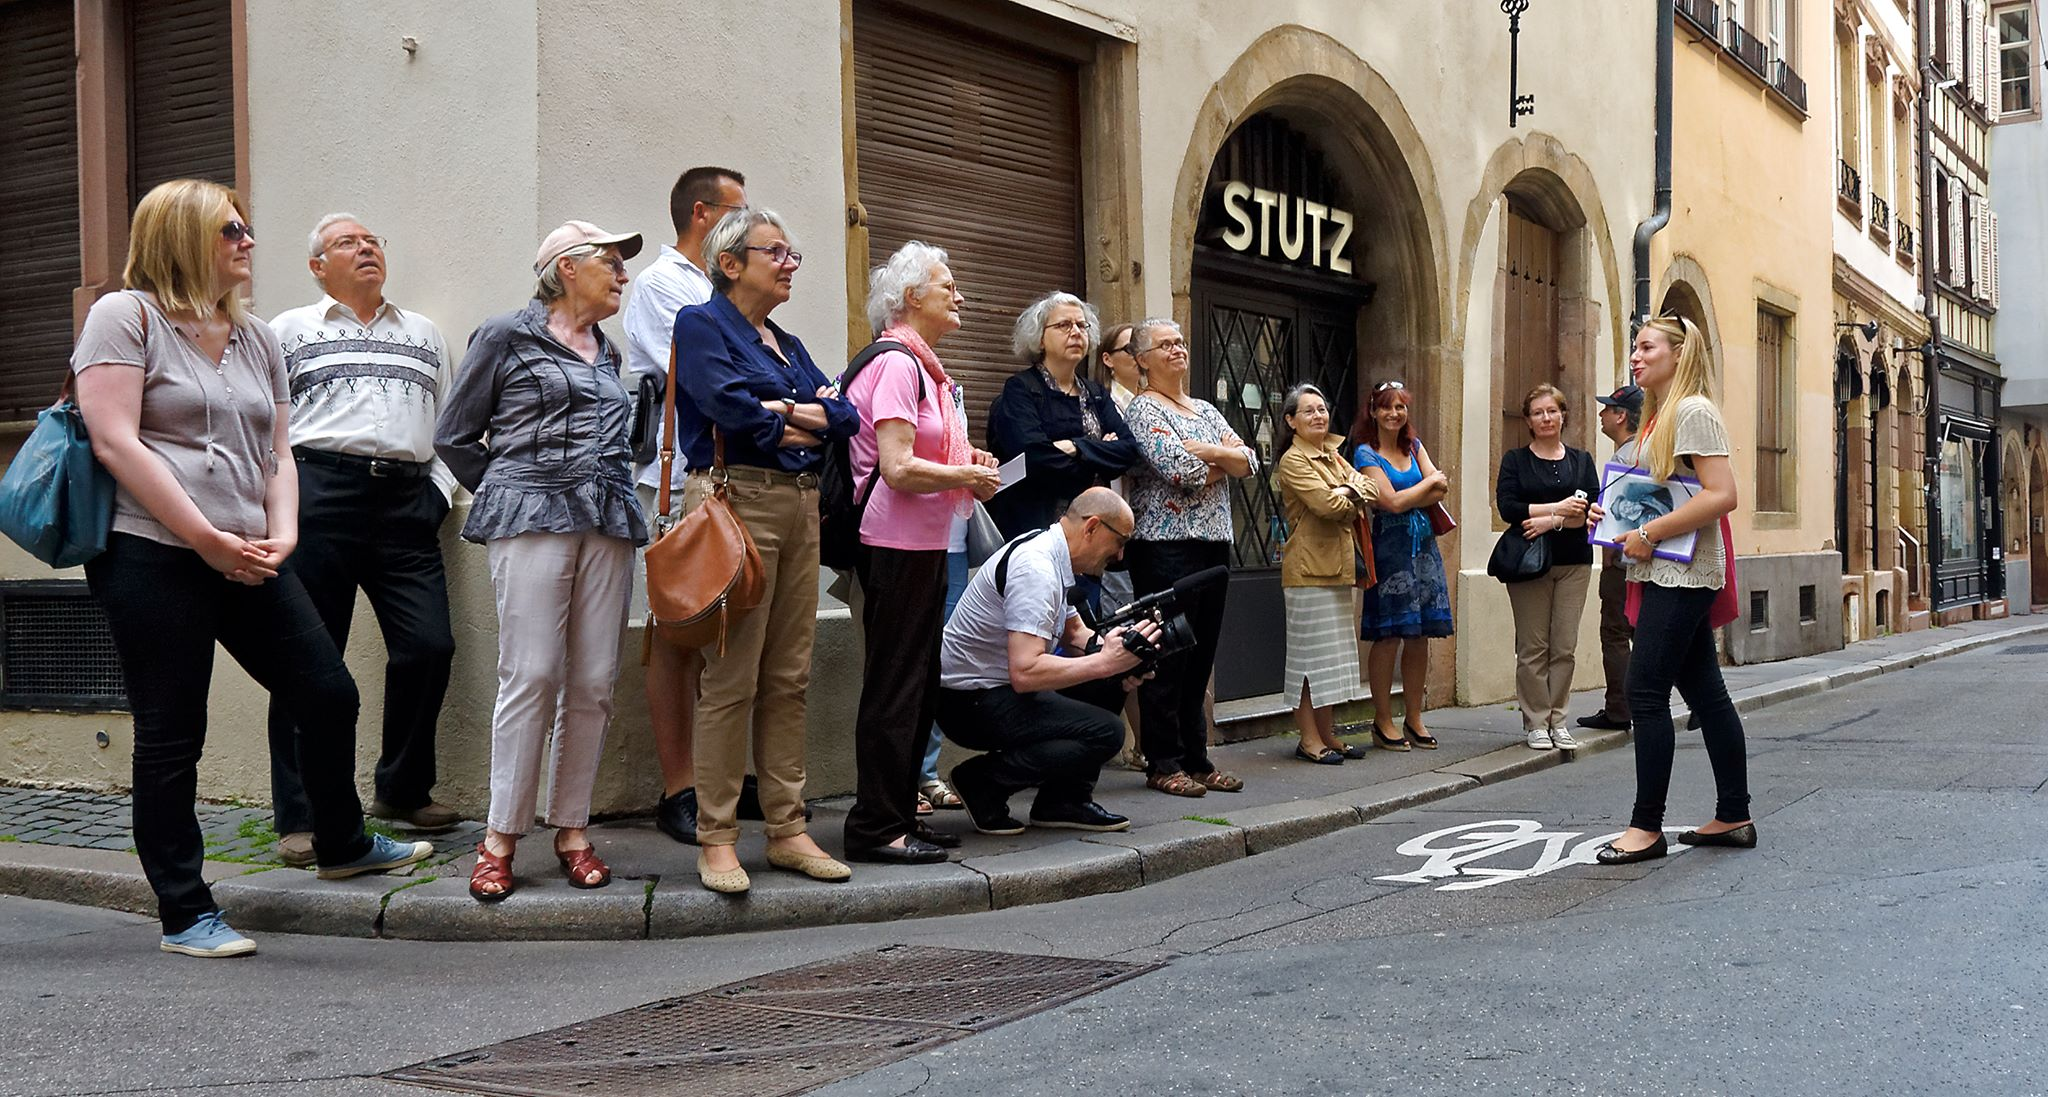 Juliette Bossert Guide Strasbourg